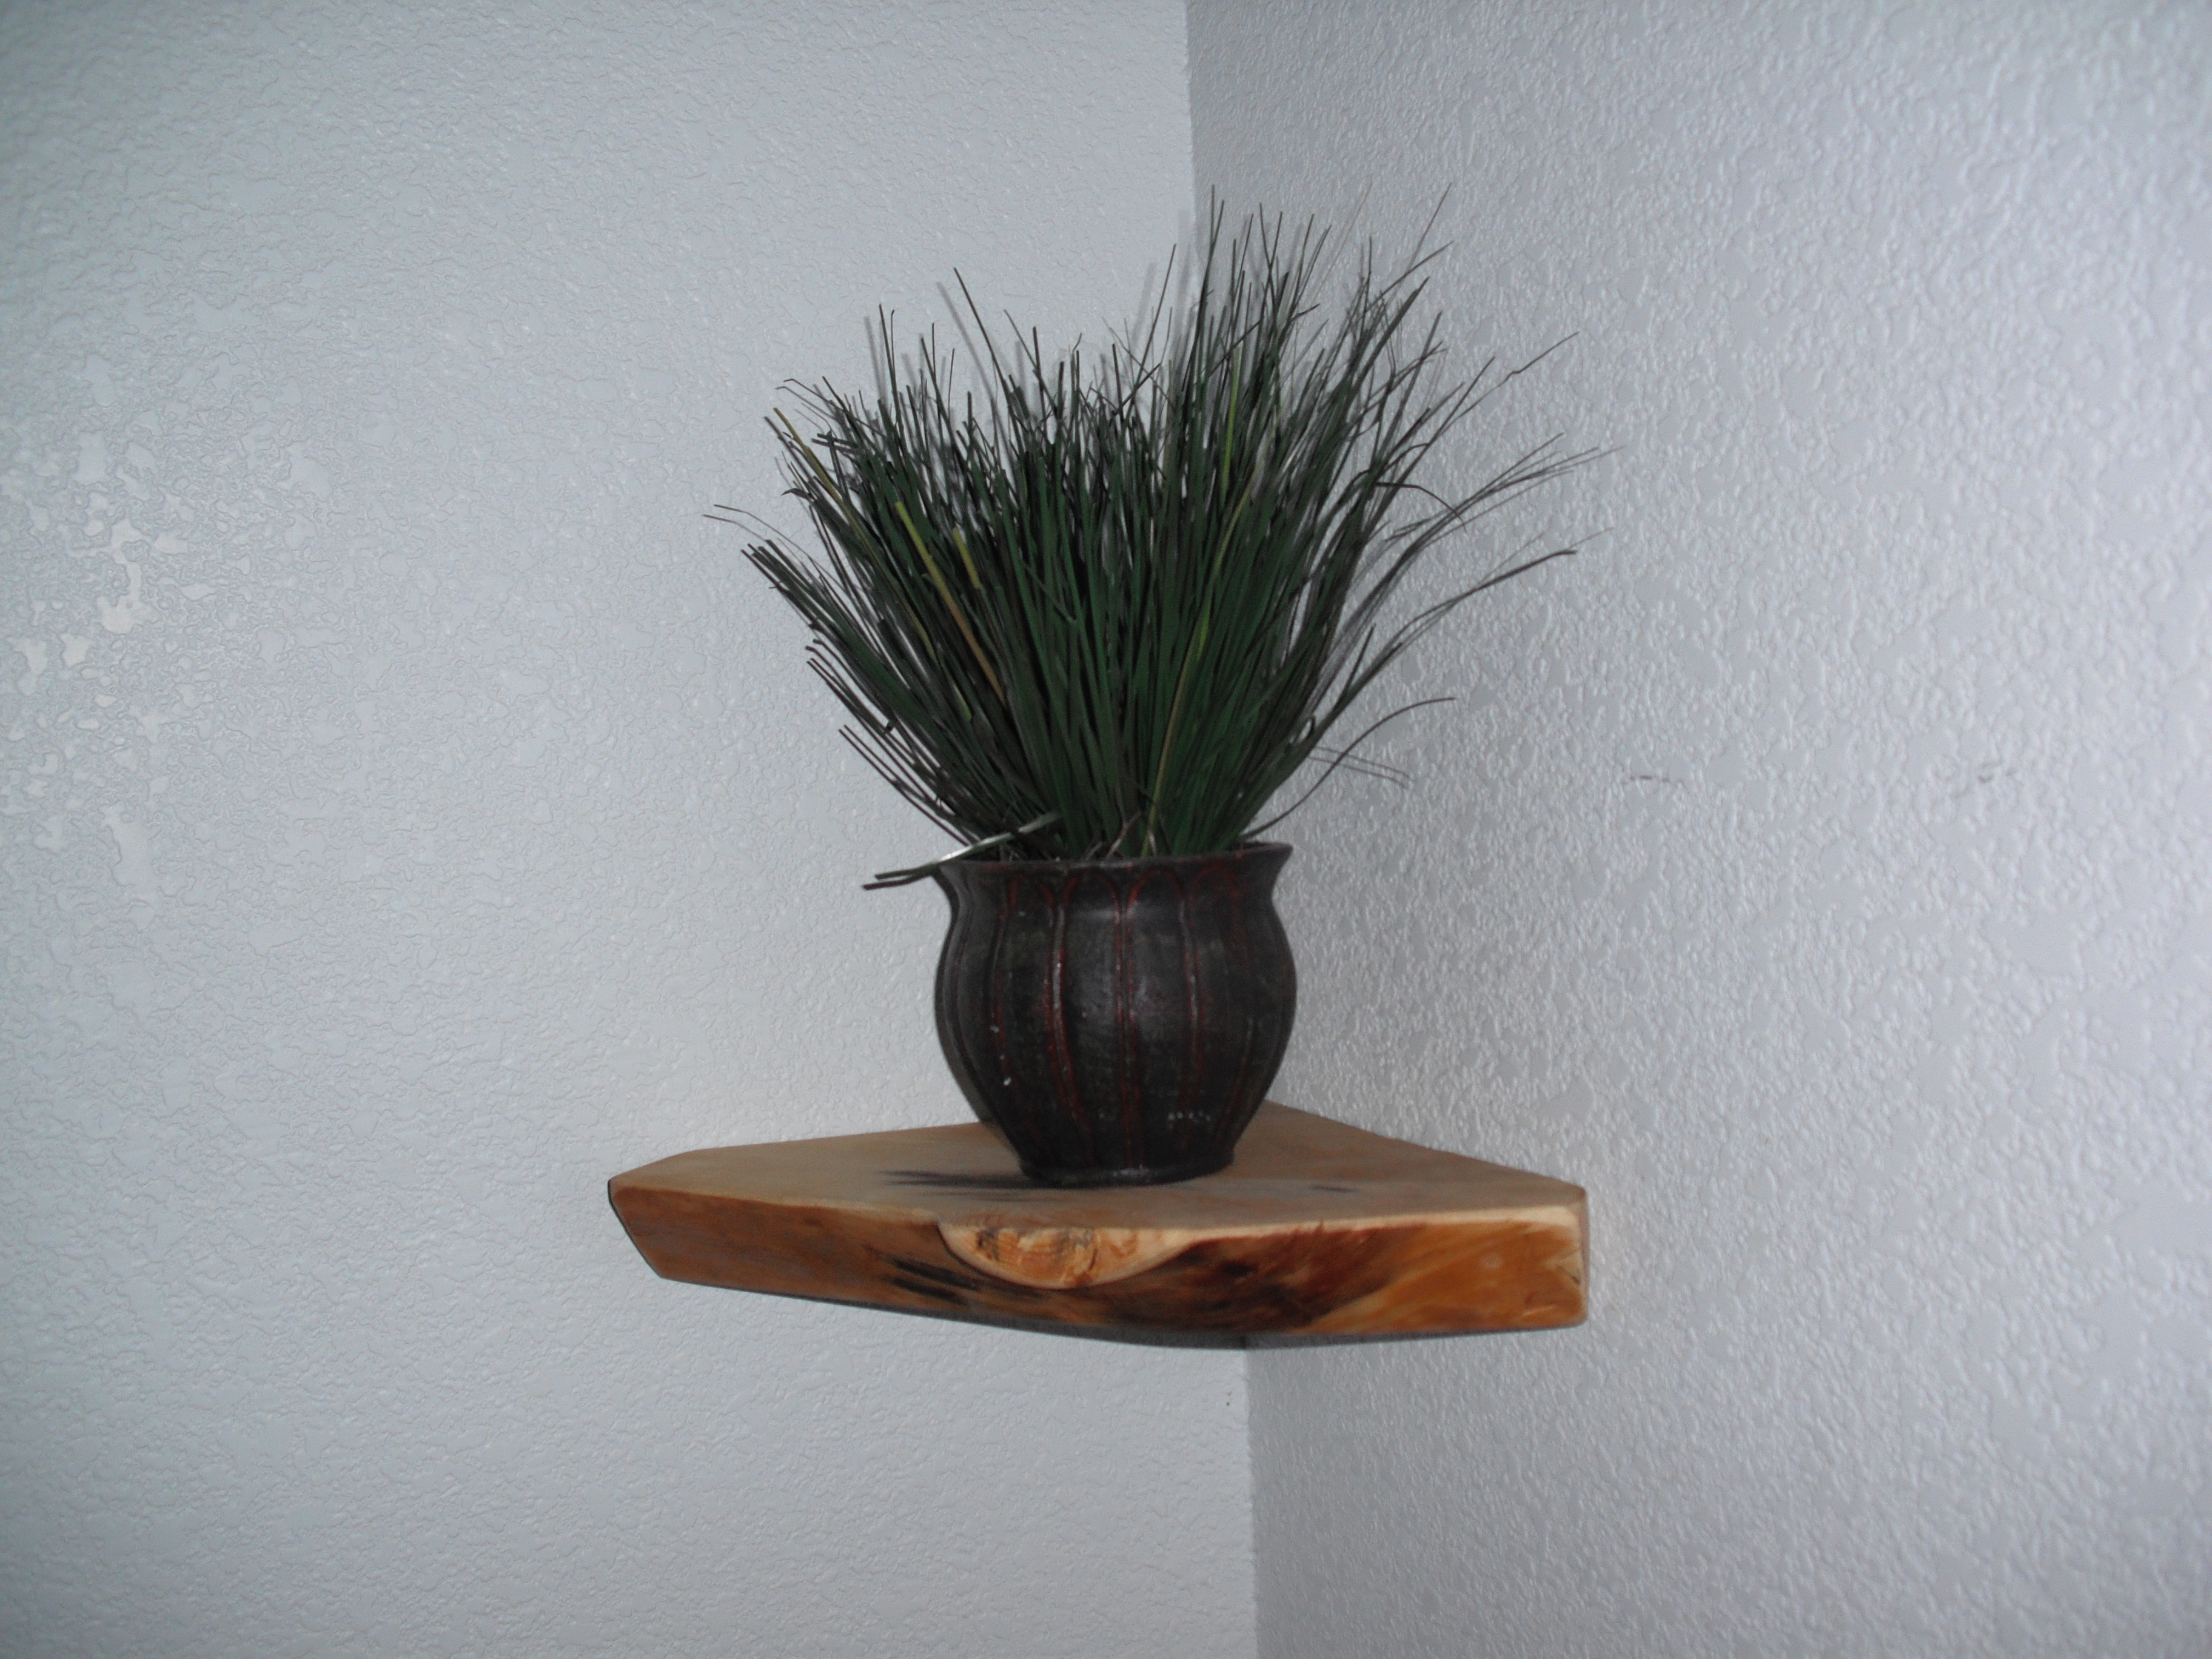 How to make a natural pine corner shelf in under 5 min.